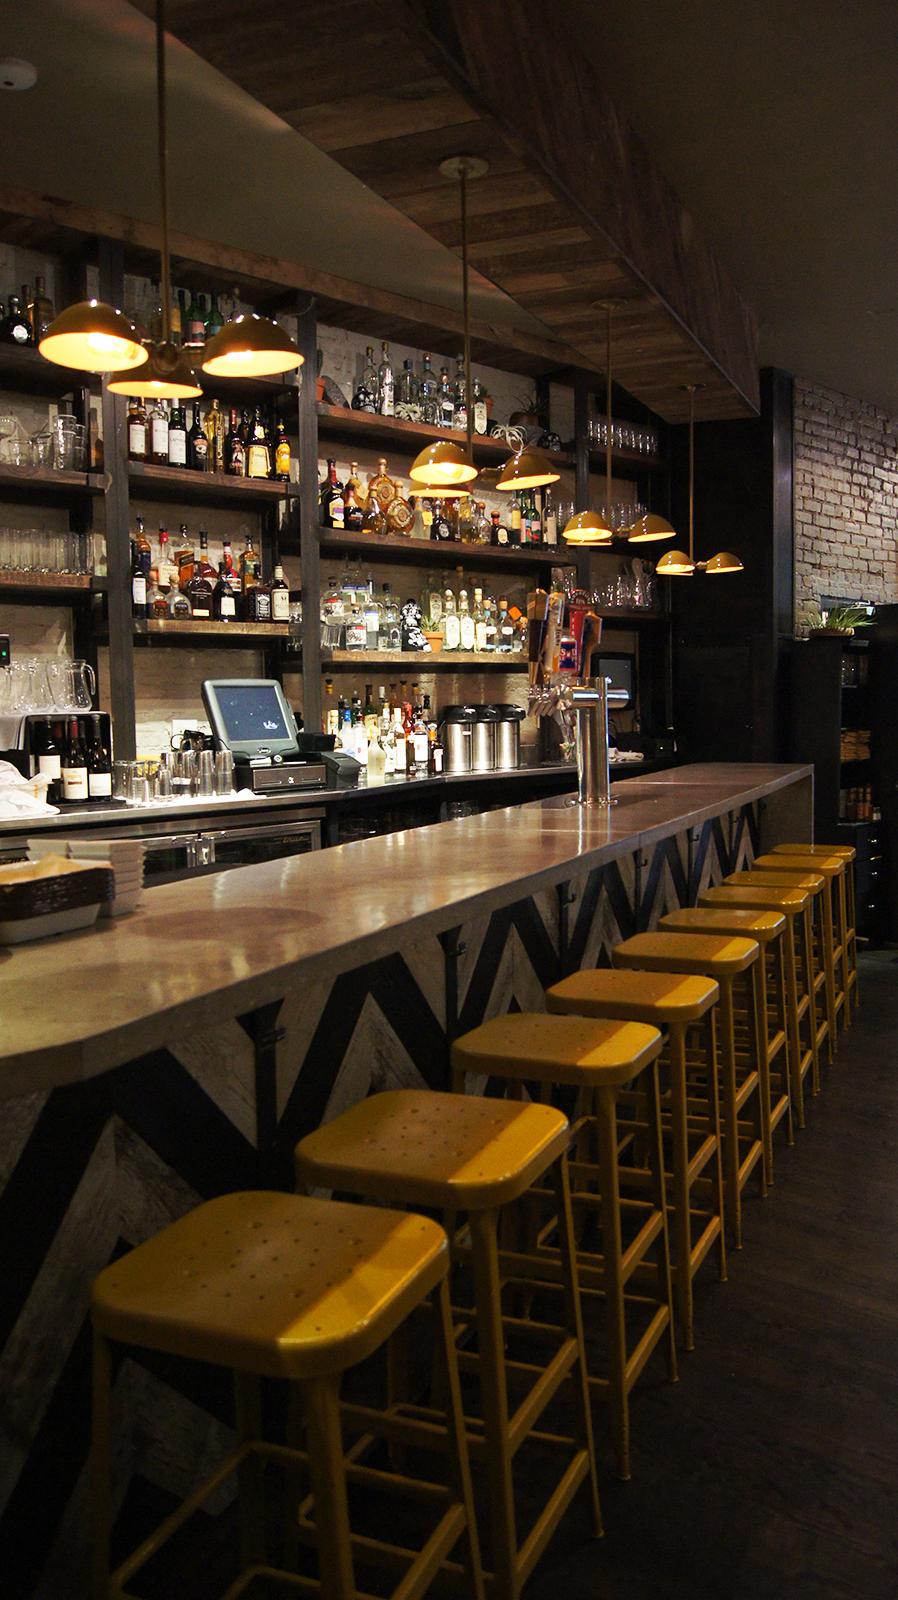 Lolita-Bar with Stools-01.jpg